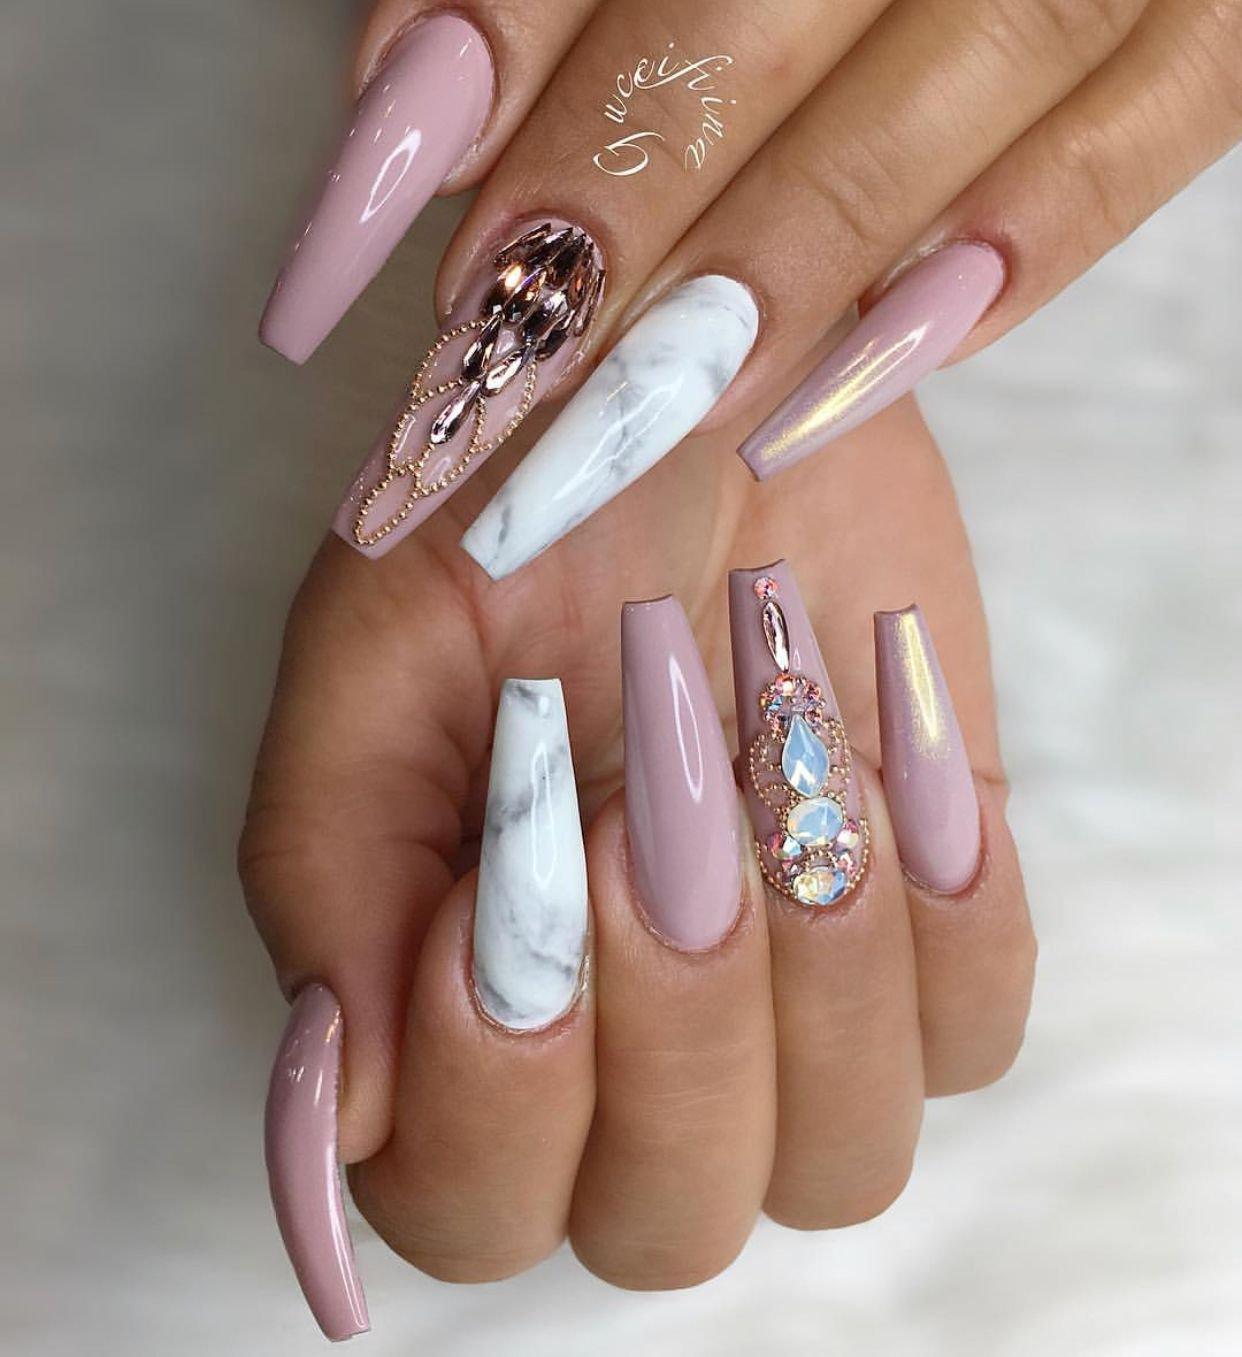 Картинки ногтей формы балерина